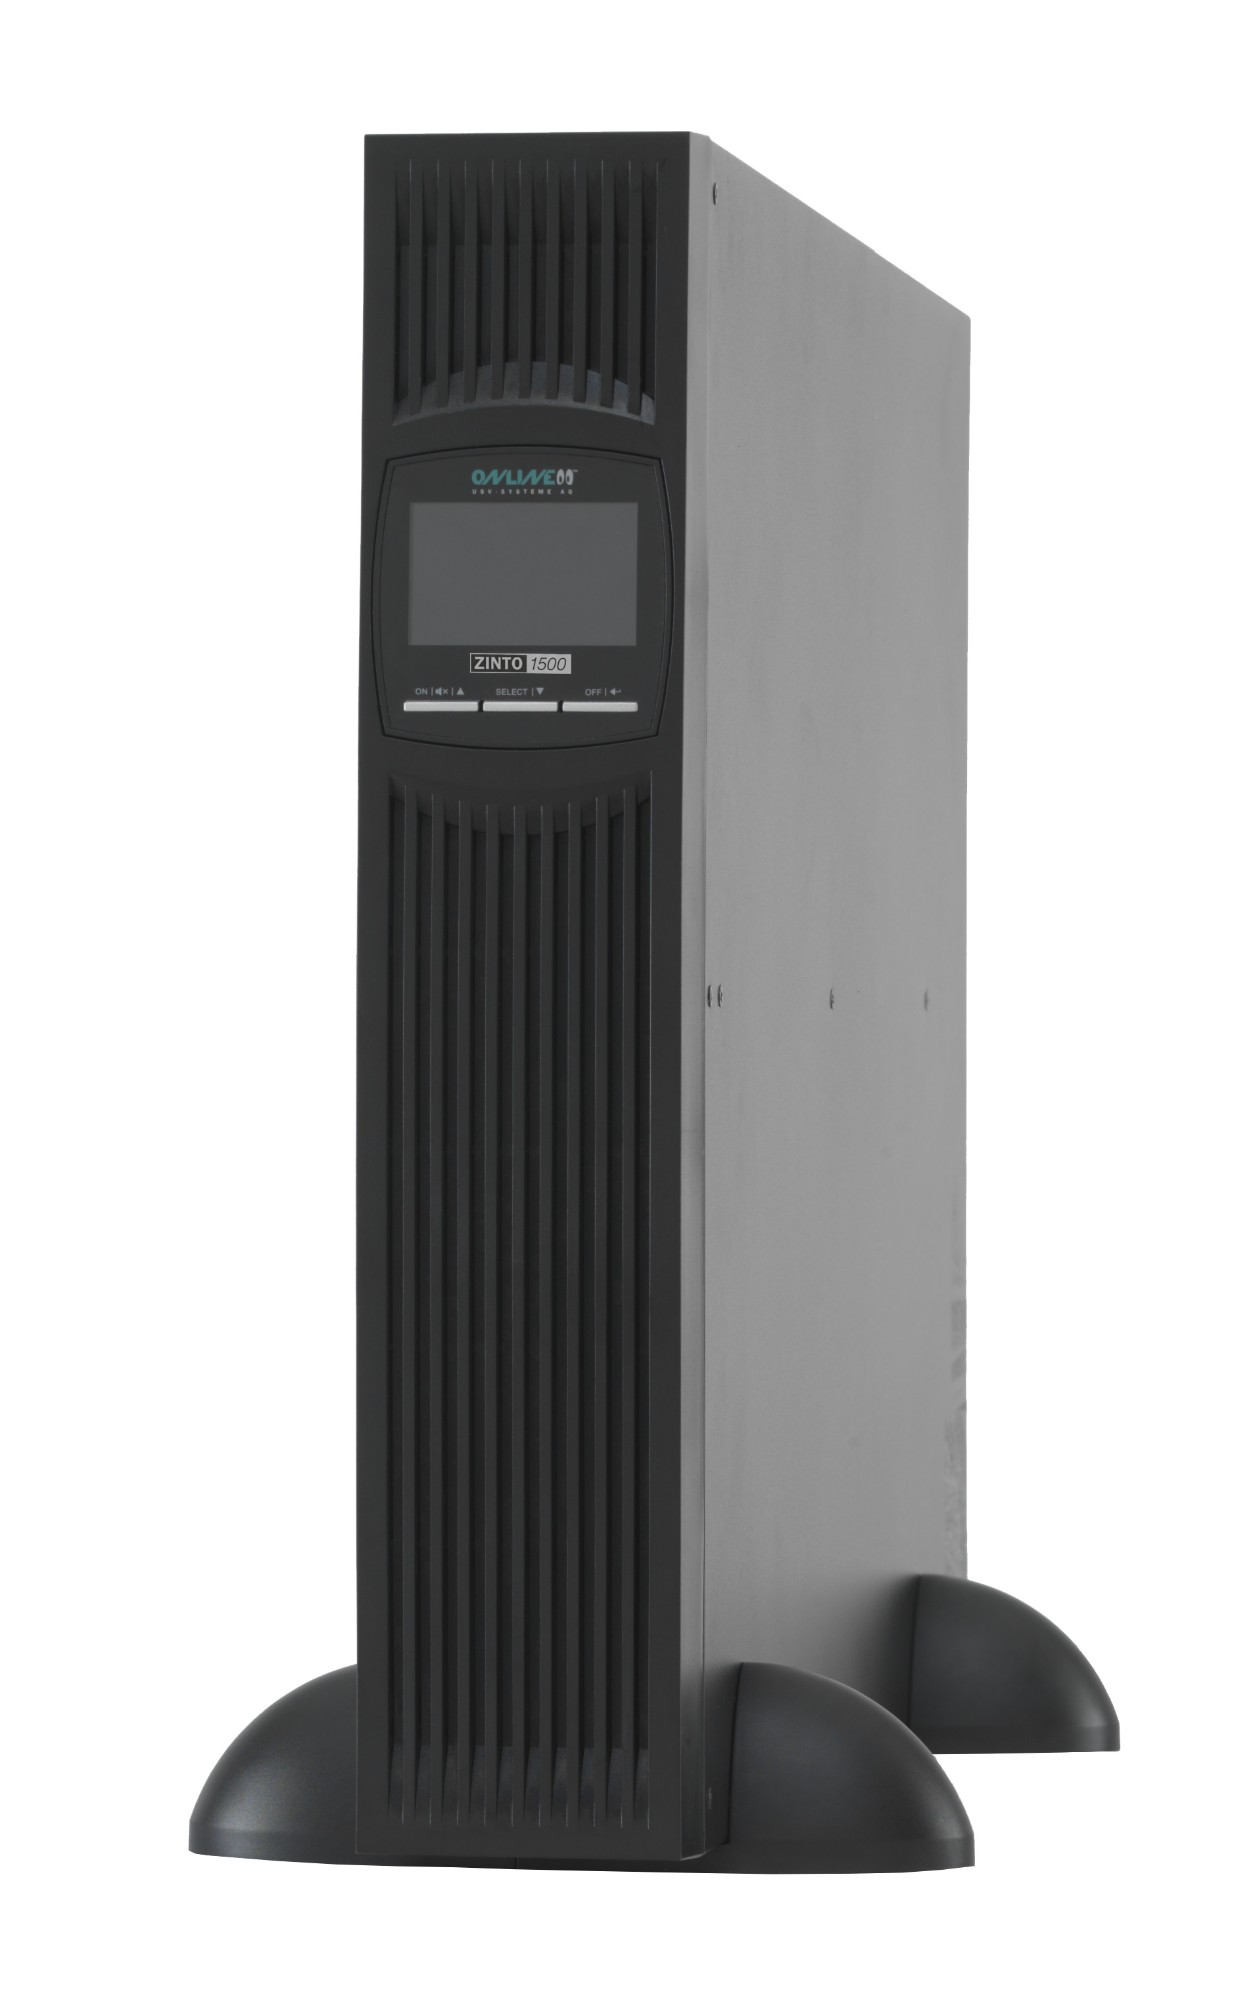 ONLINE USV-Systeme ZINTO 1500 uninterruptible power supply (UPS) Line-Interactive 1500 VA 1350 W 8 A